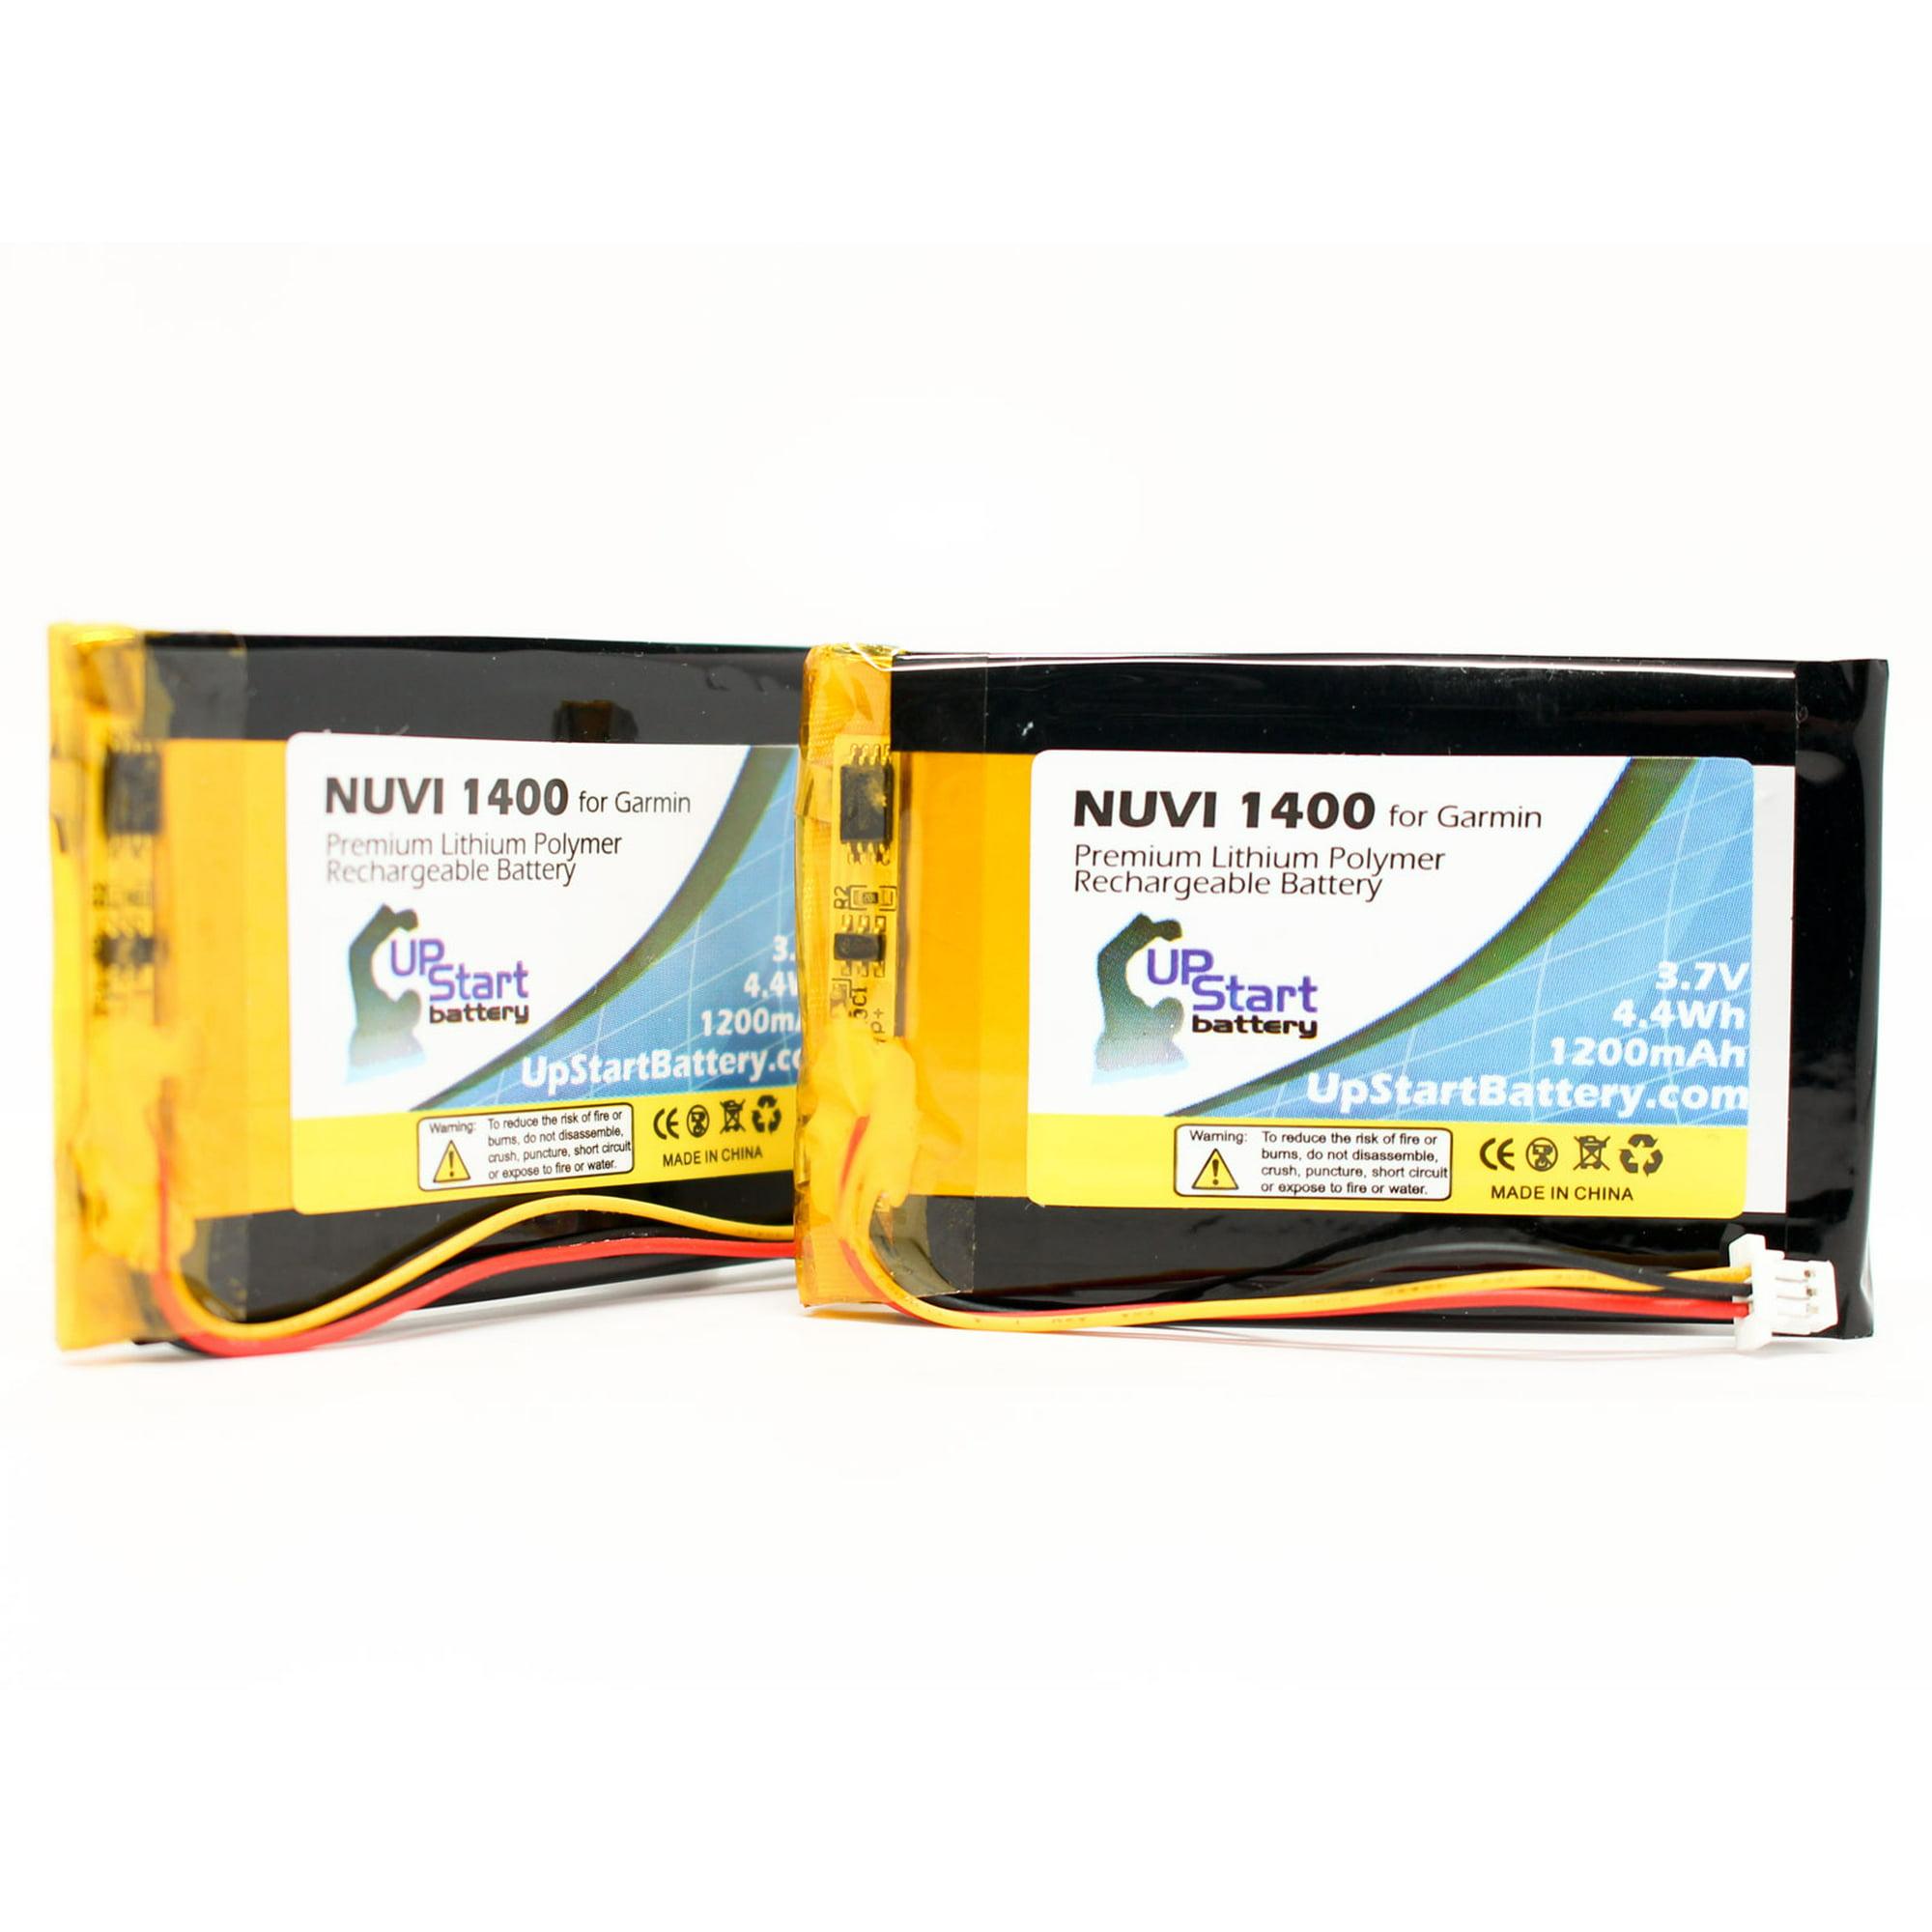 2x Pack - Garmin Nuvi 1400 Battery - Replacement for Garmin ED38BD4251U20  GPS Battery (1200mAh, 3 7V, Lithium Polymer)